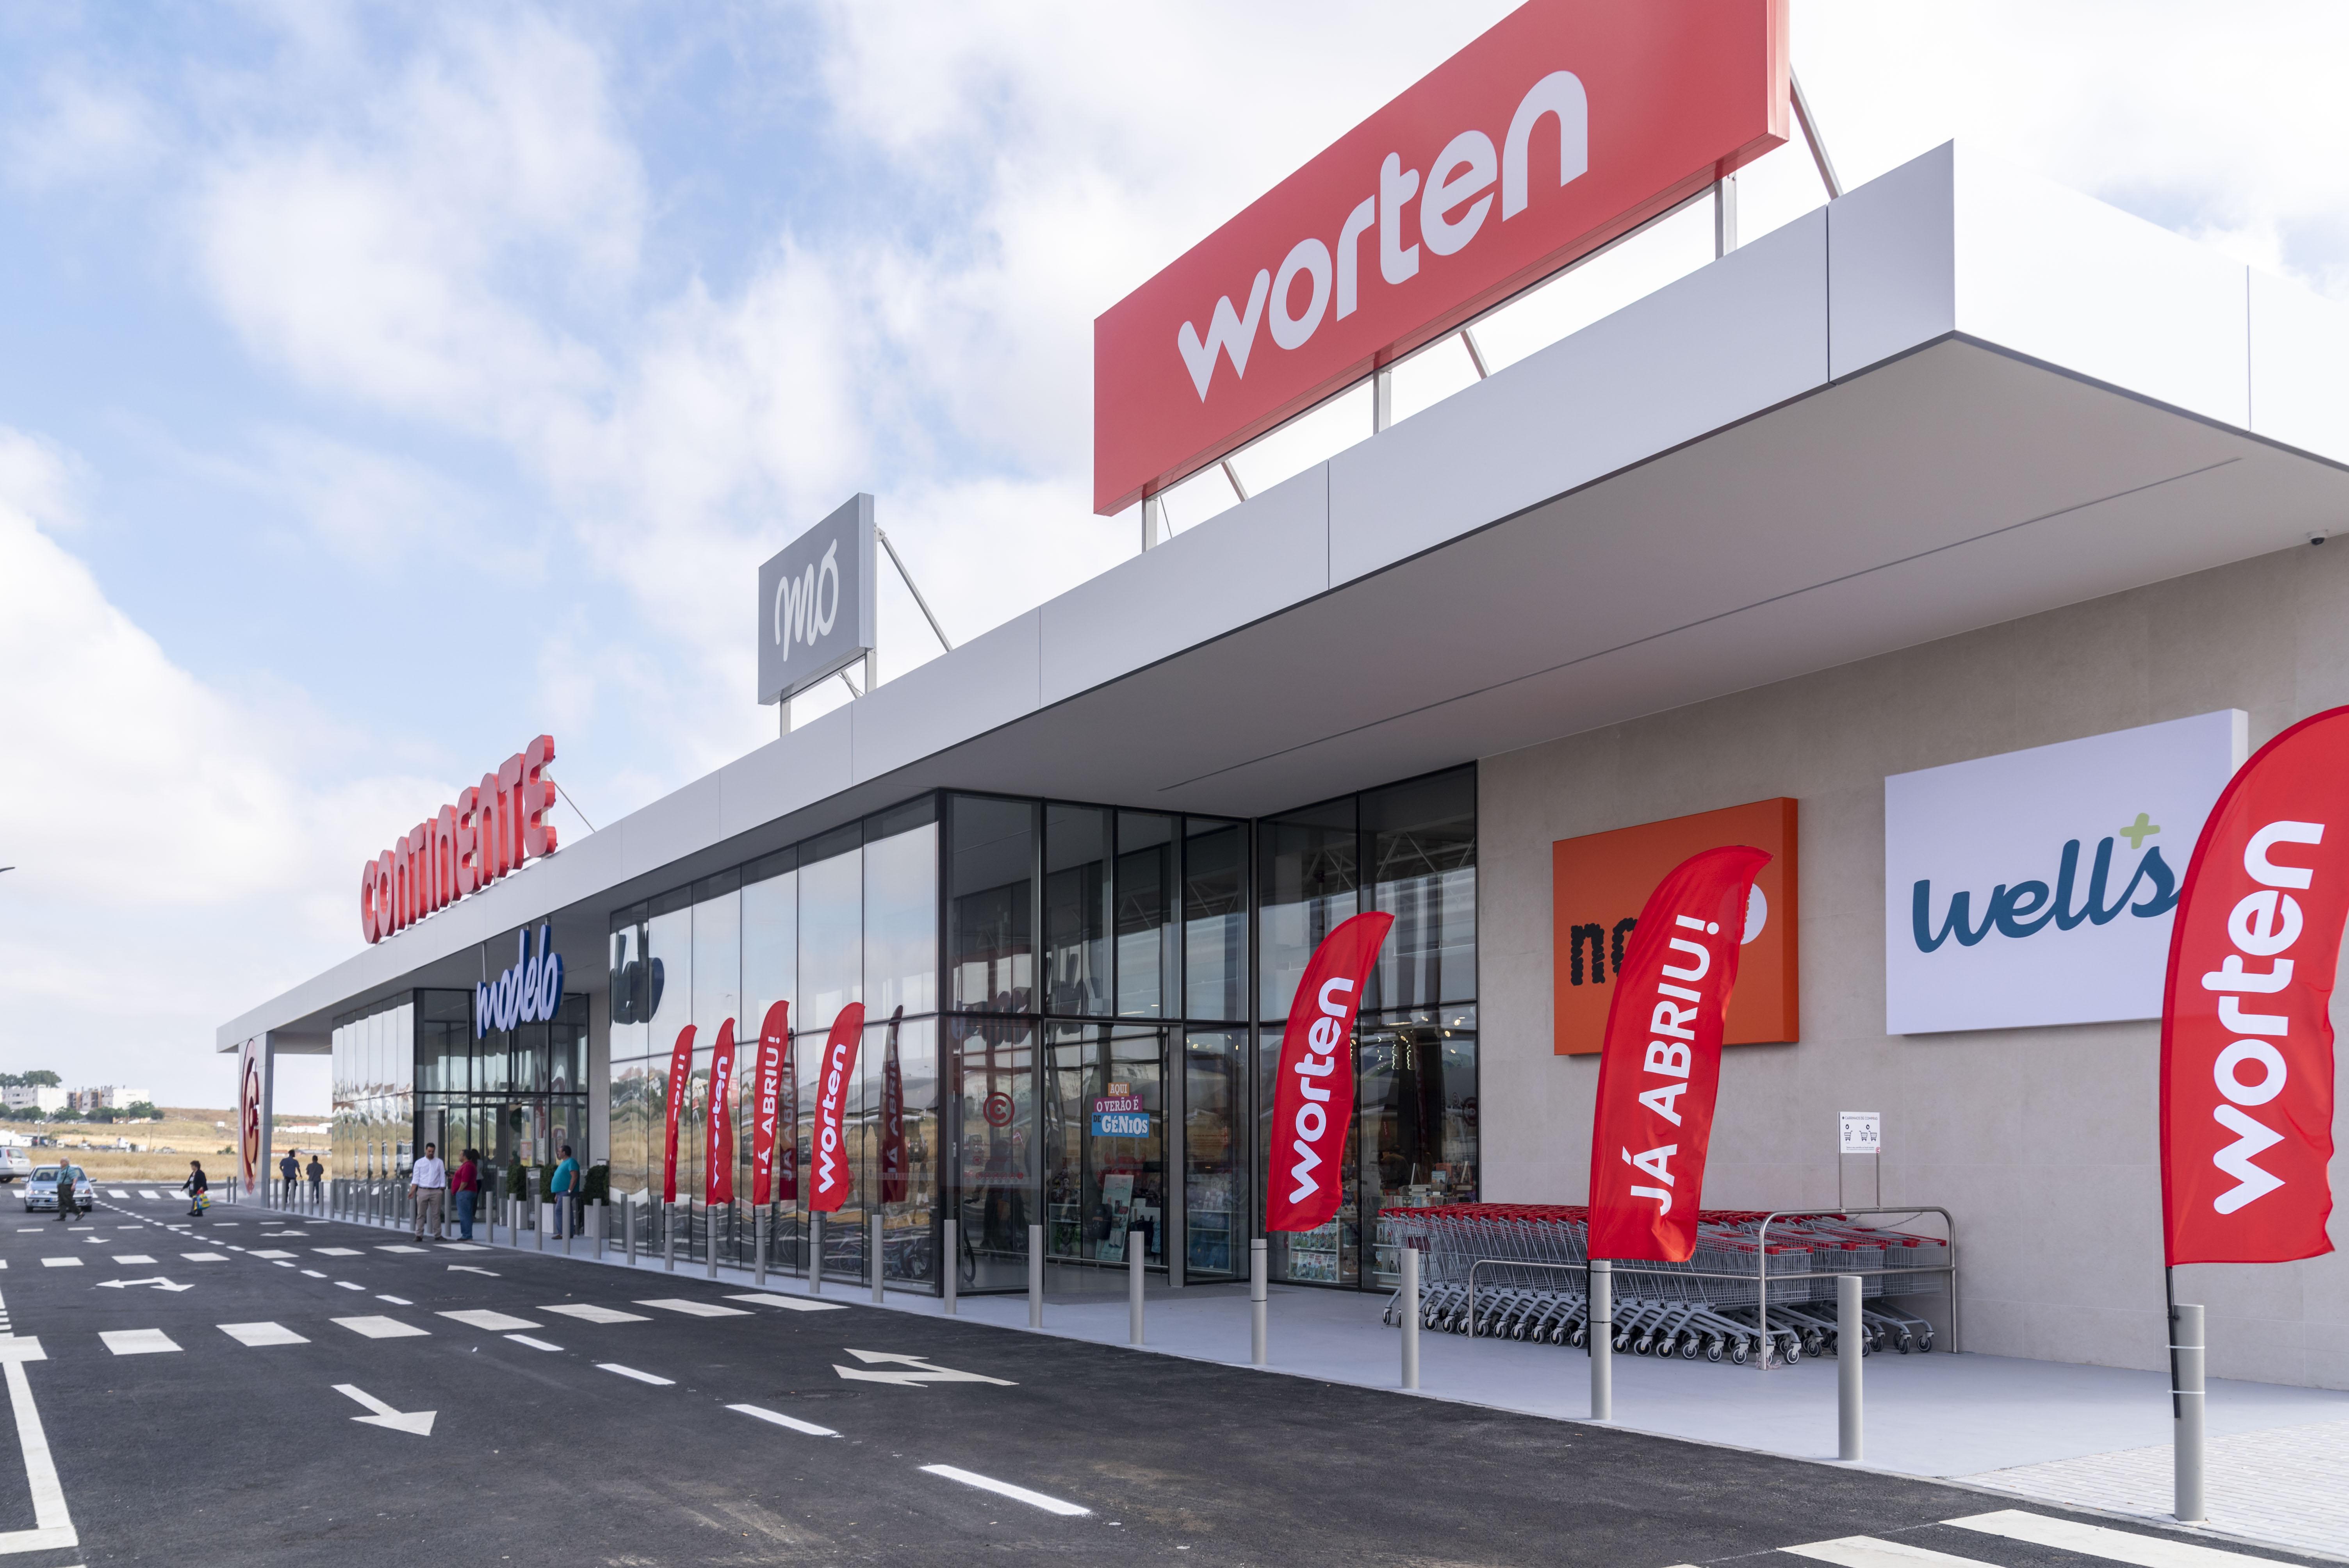 Continente Modelo Beja Retail